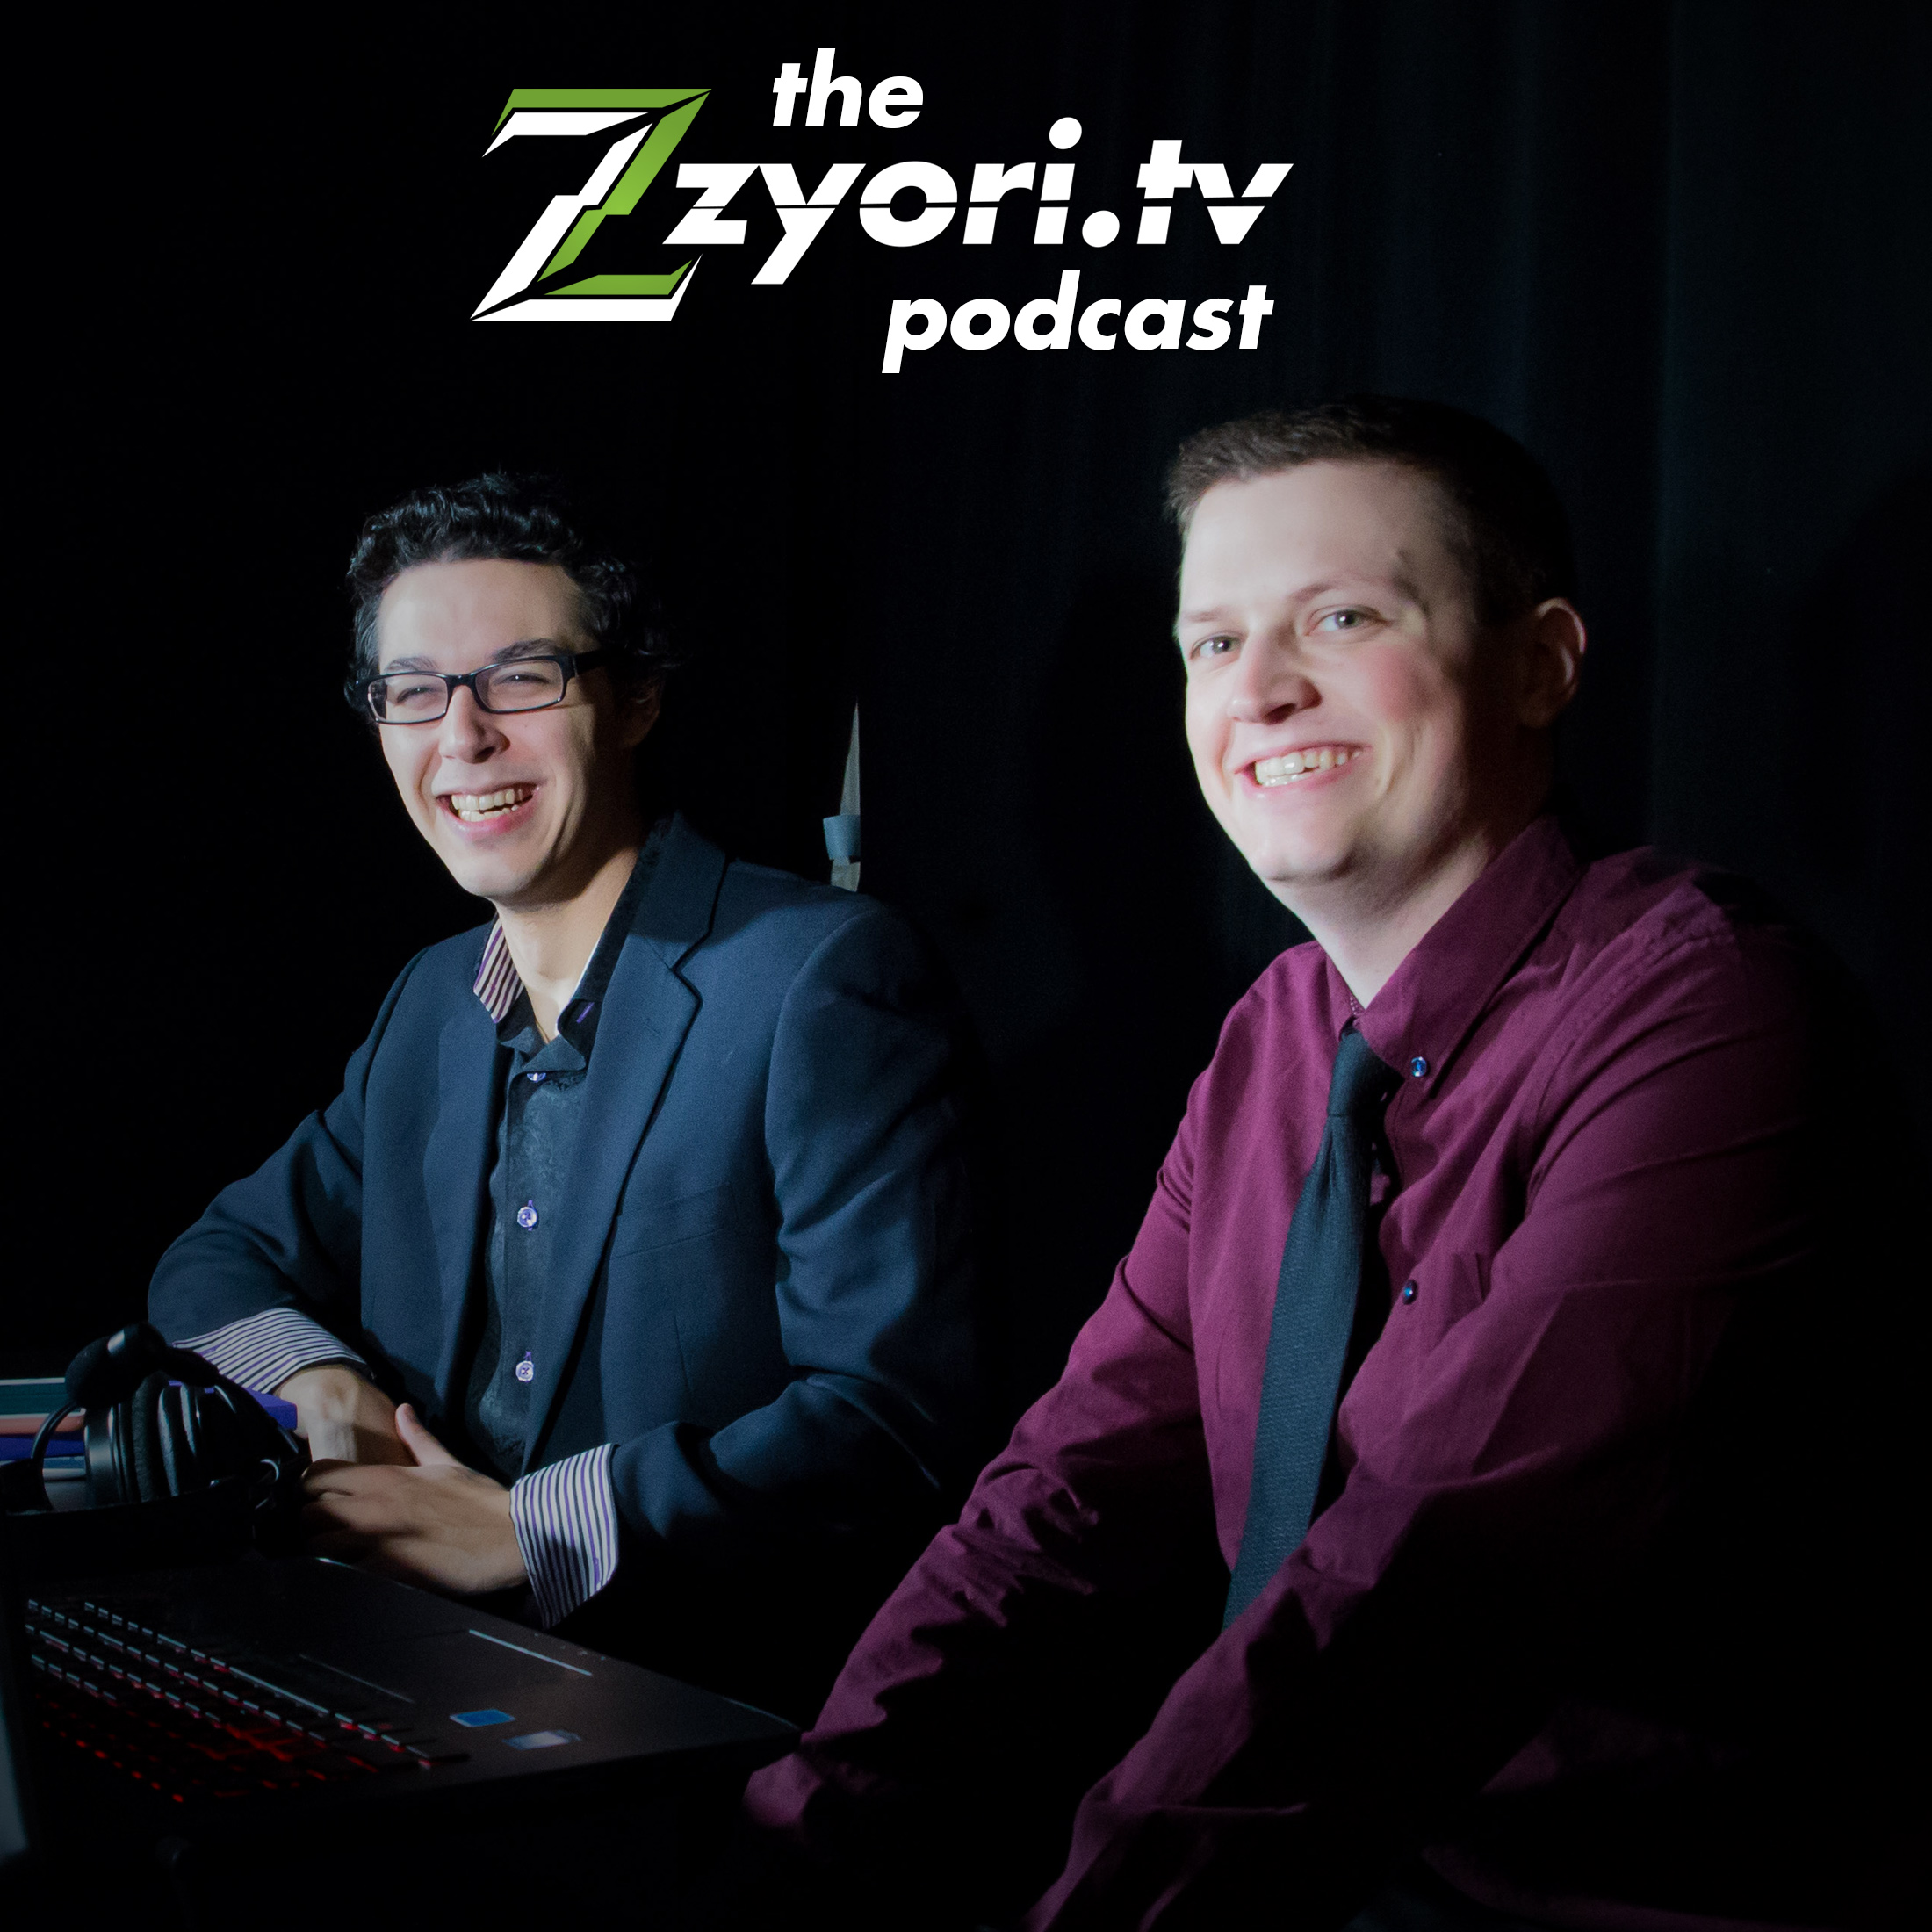 The Zyori Podcast